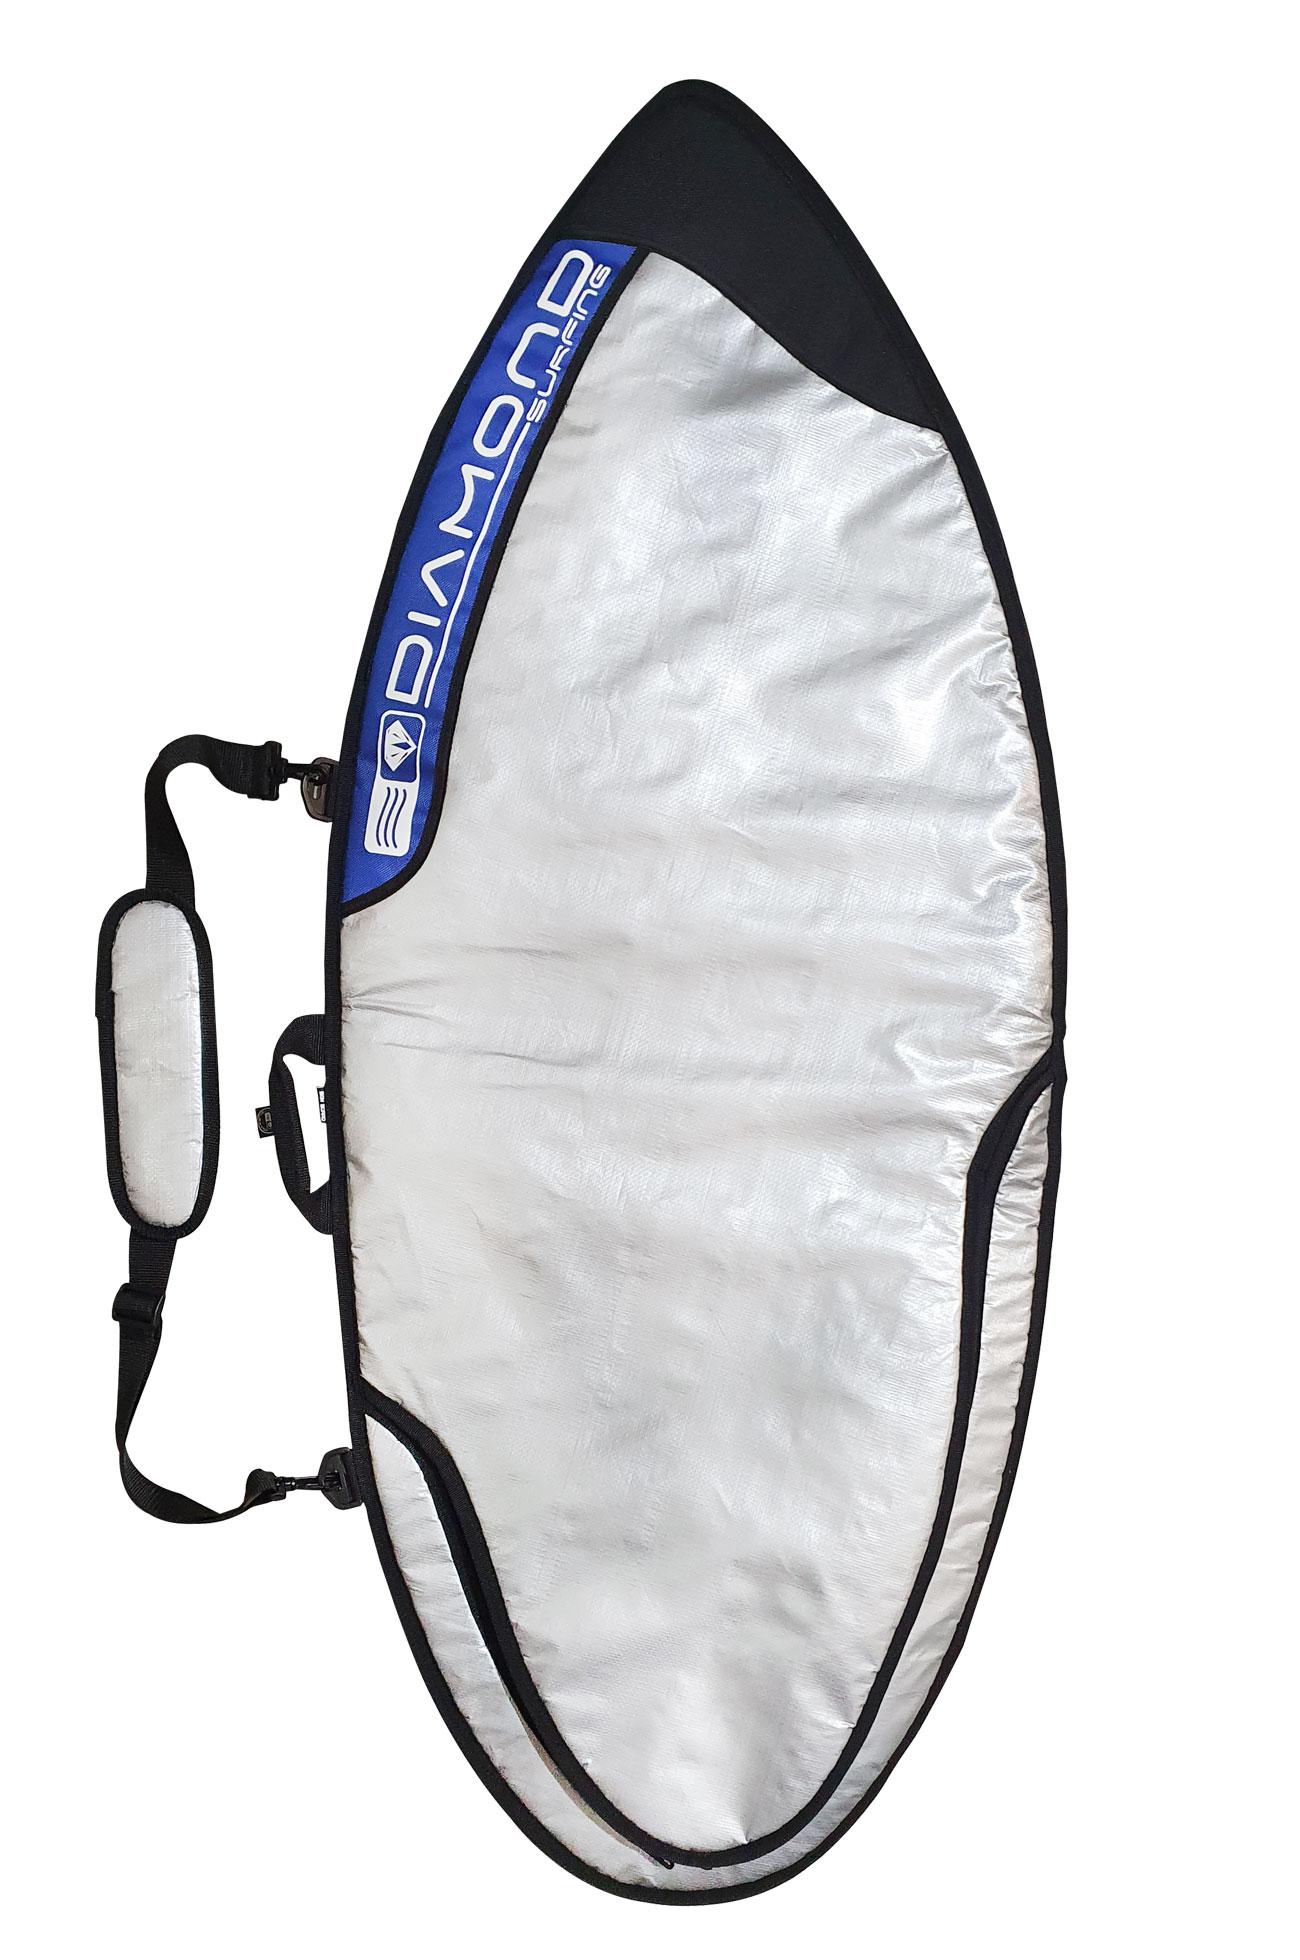 Capa Para Skimboard Reforçada 120x52cm  6mm Diamond Surfing